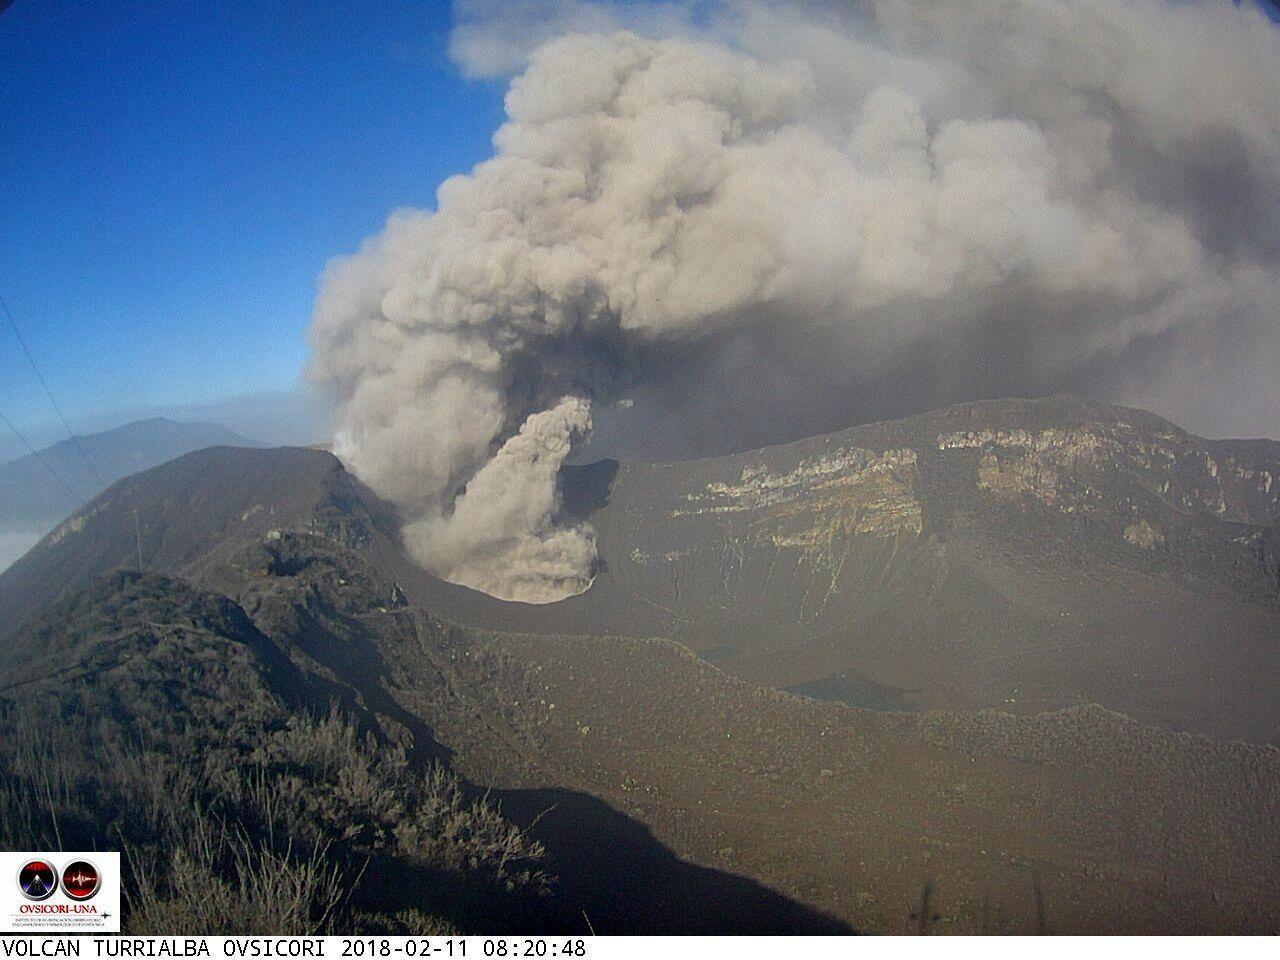 Turrialba - passive ash emissions on 11.02.2018 / 8:20 - Ovsicori webcam